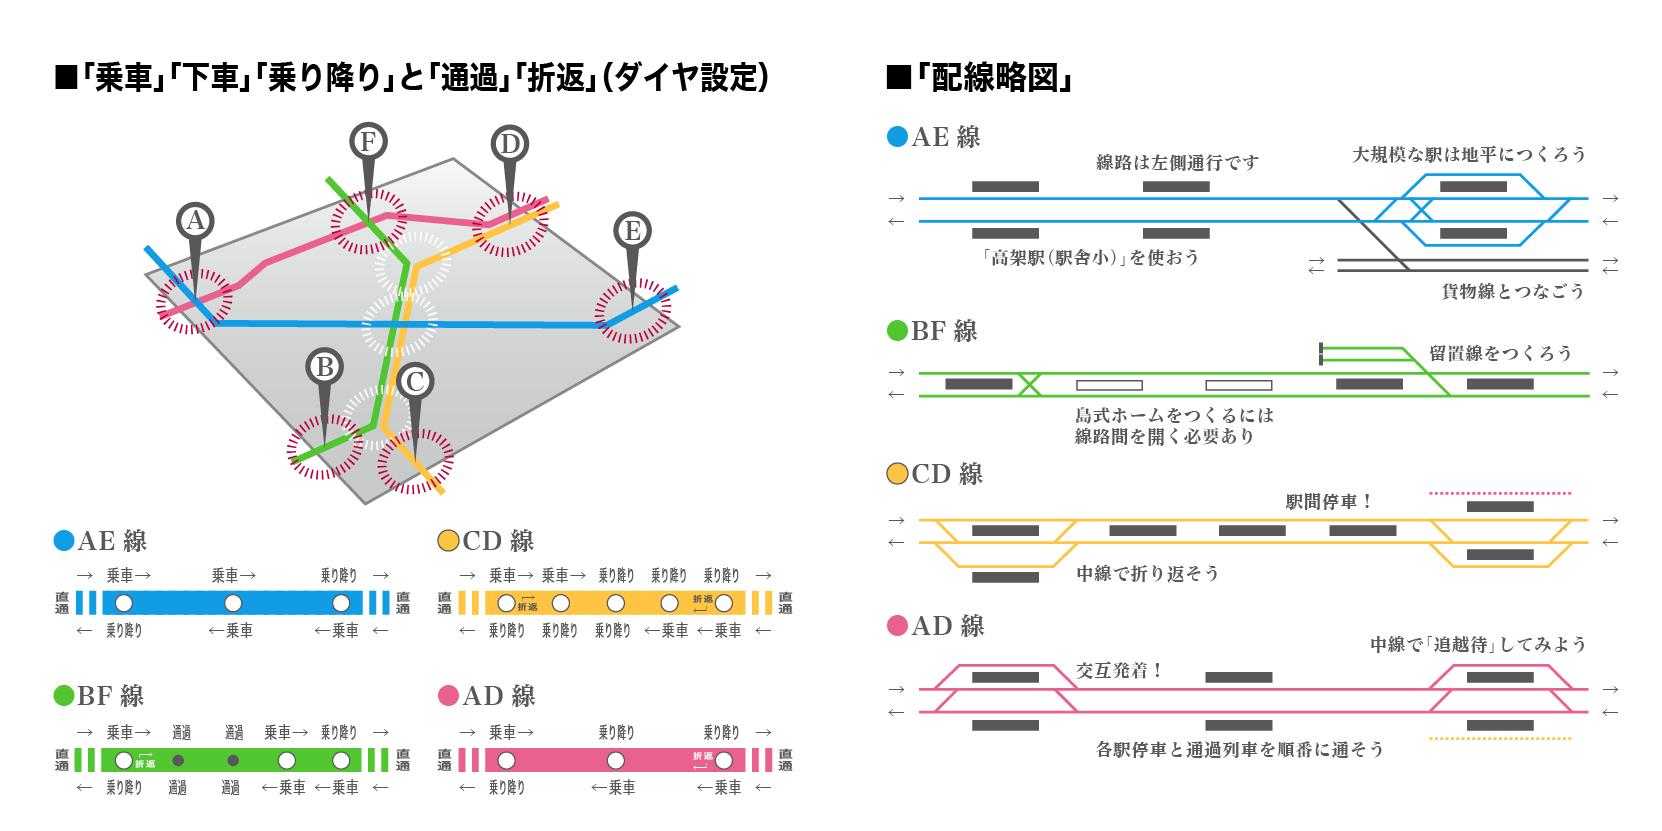 https://neorail.jp/forum/uploads/a9_basics_line02.png?ref=3861